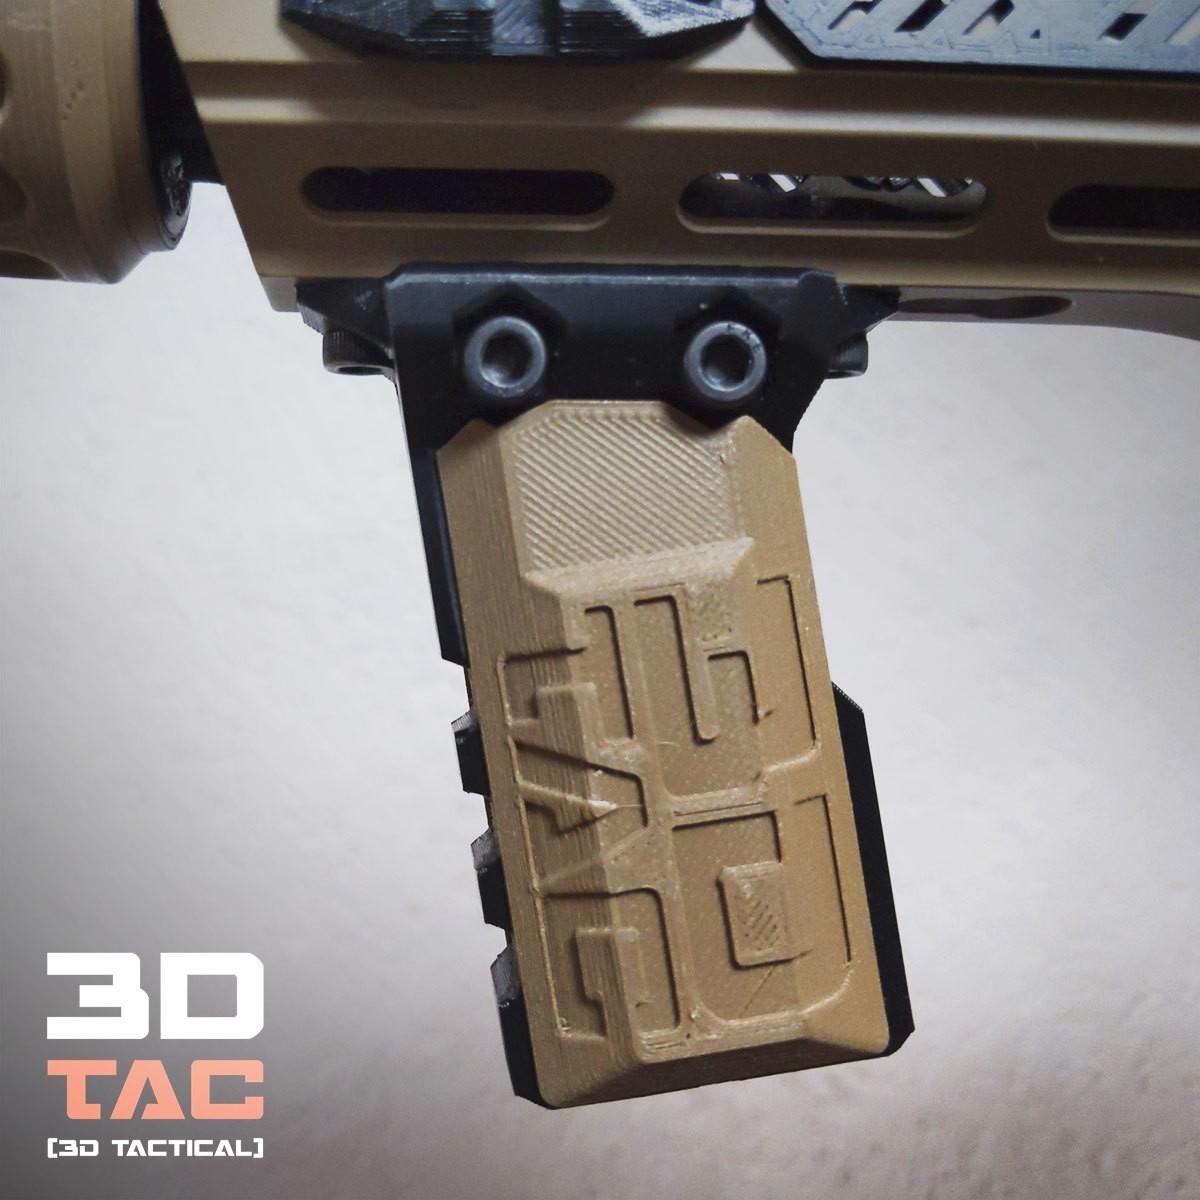 3DTAC_Covers_VertX_1.jpg Download STL file 3DTAC / VERTX 80° Tactical Grip • 3D printing template, 3DMX